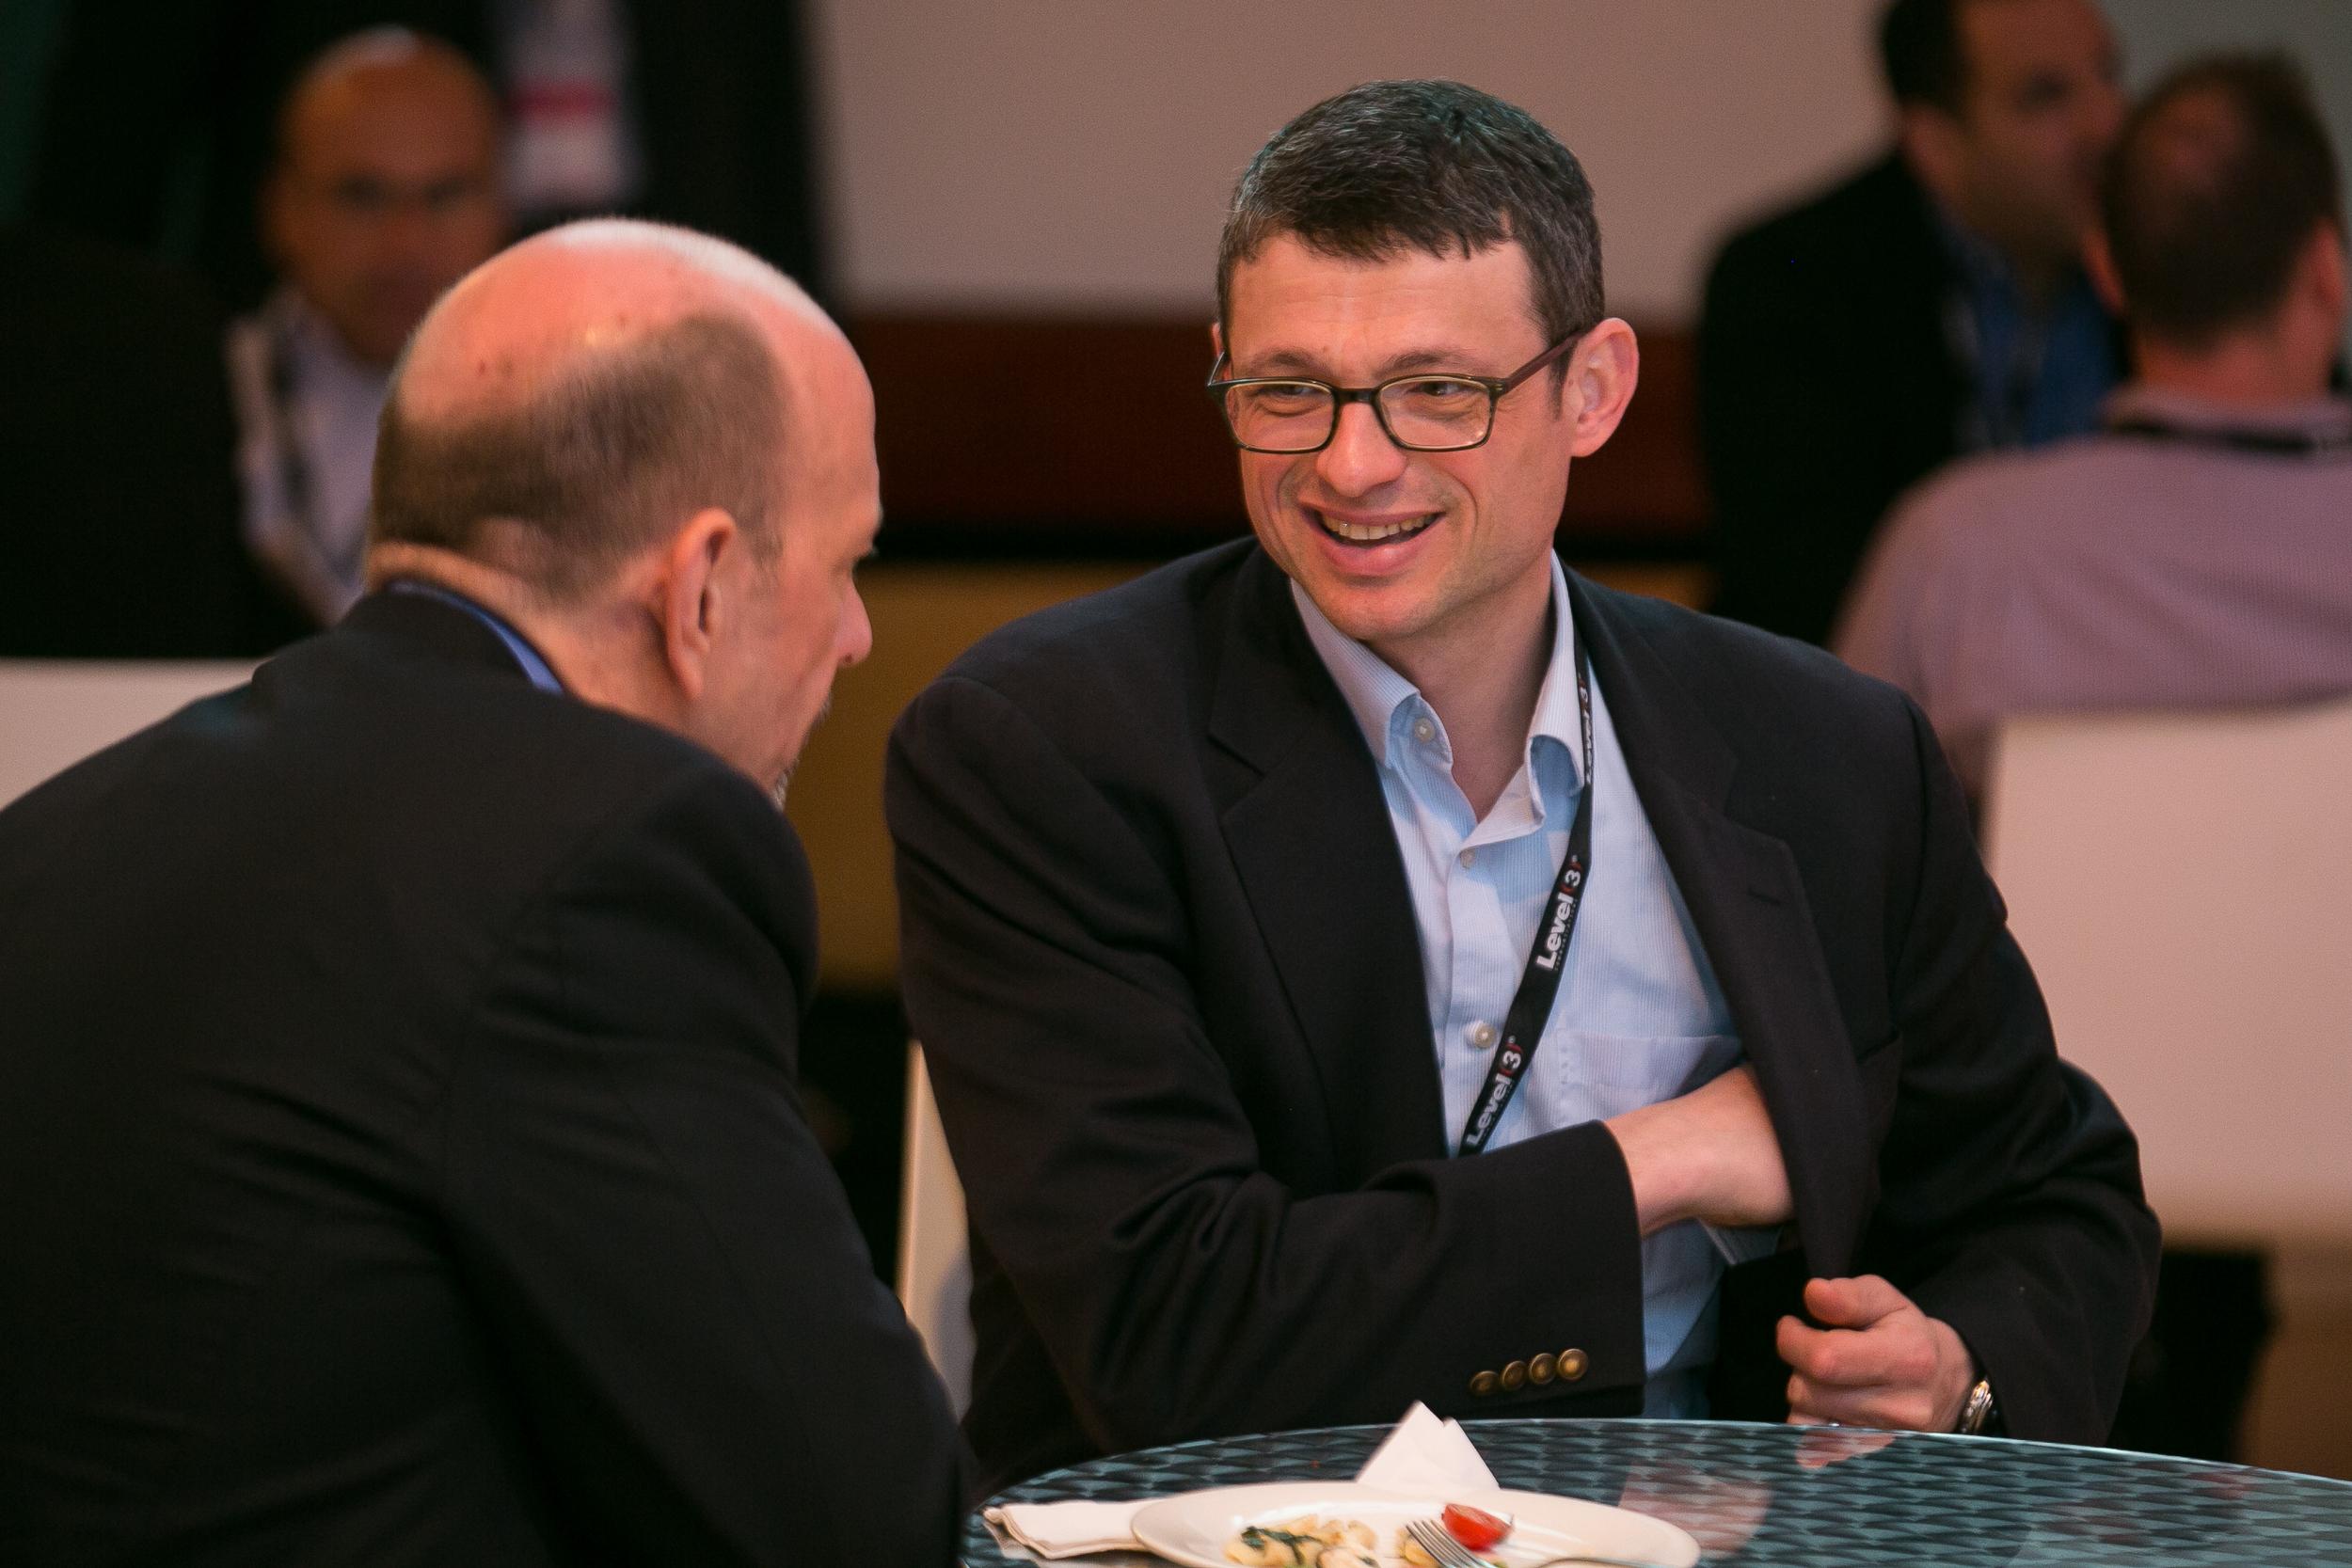 043-Capacity_Conferences-WAN_Summit-042715-6P9A0038.jpg